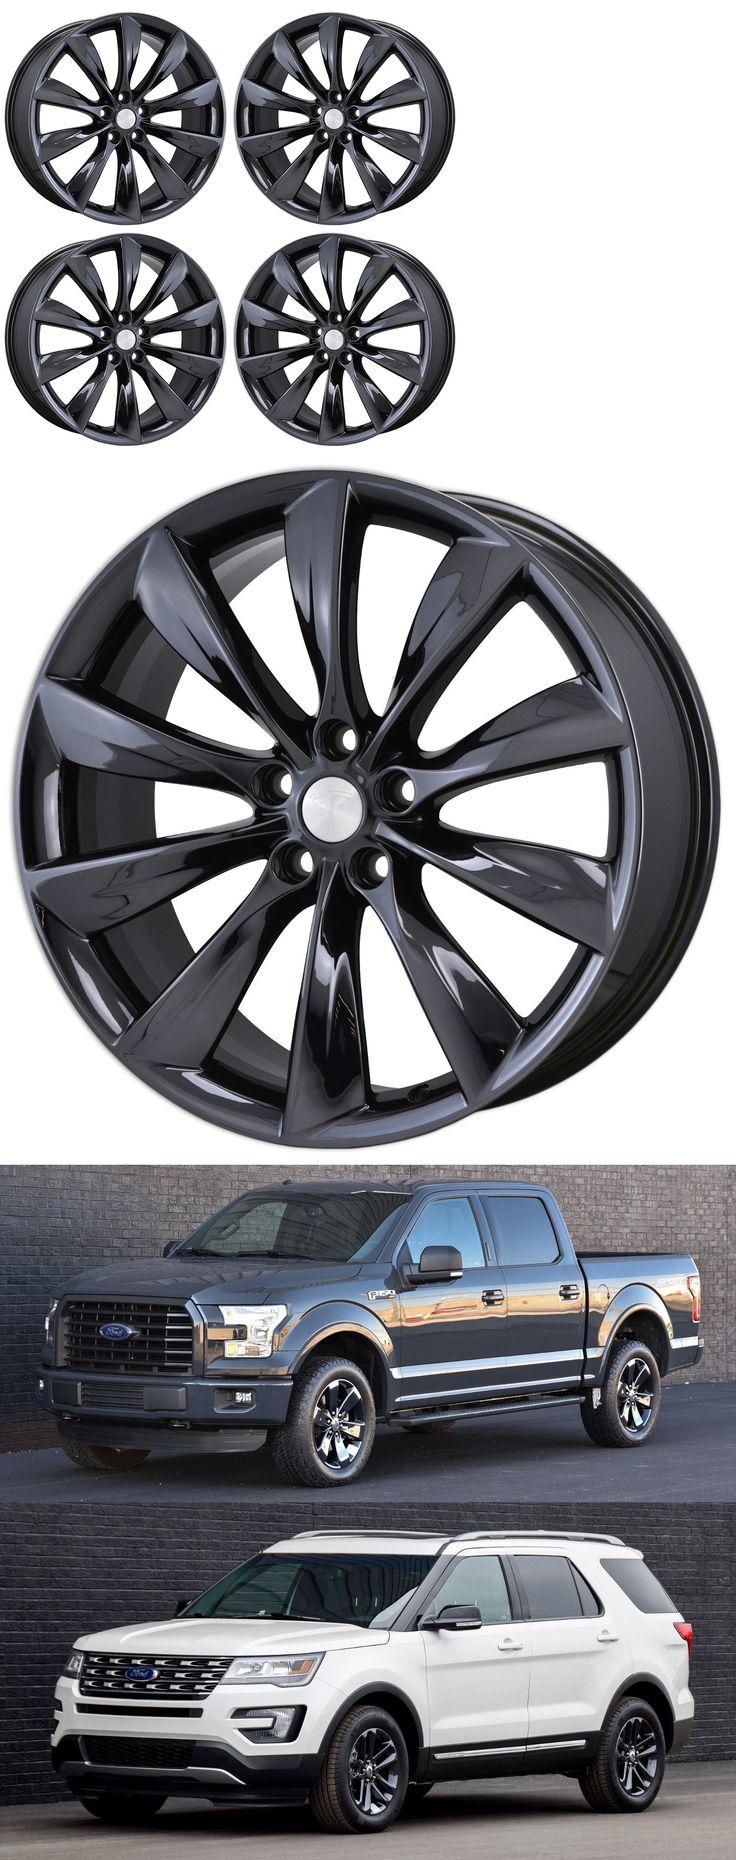 auto parts - general: 21 Tesla Model S Black Chrome Wheels Rims 2016 Factory Oem 97095 Exchange BUY IT NOW ONLY: $799.0